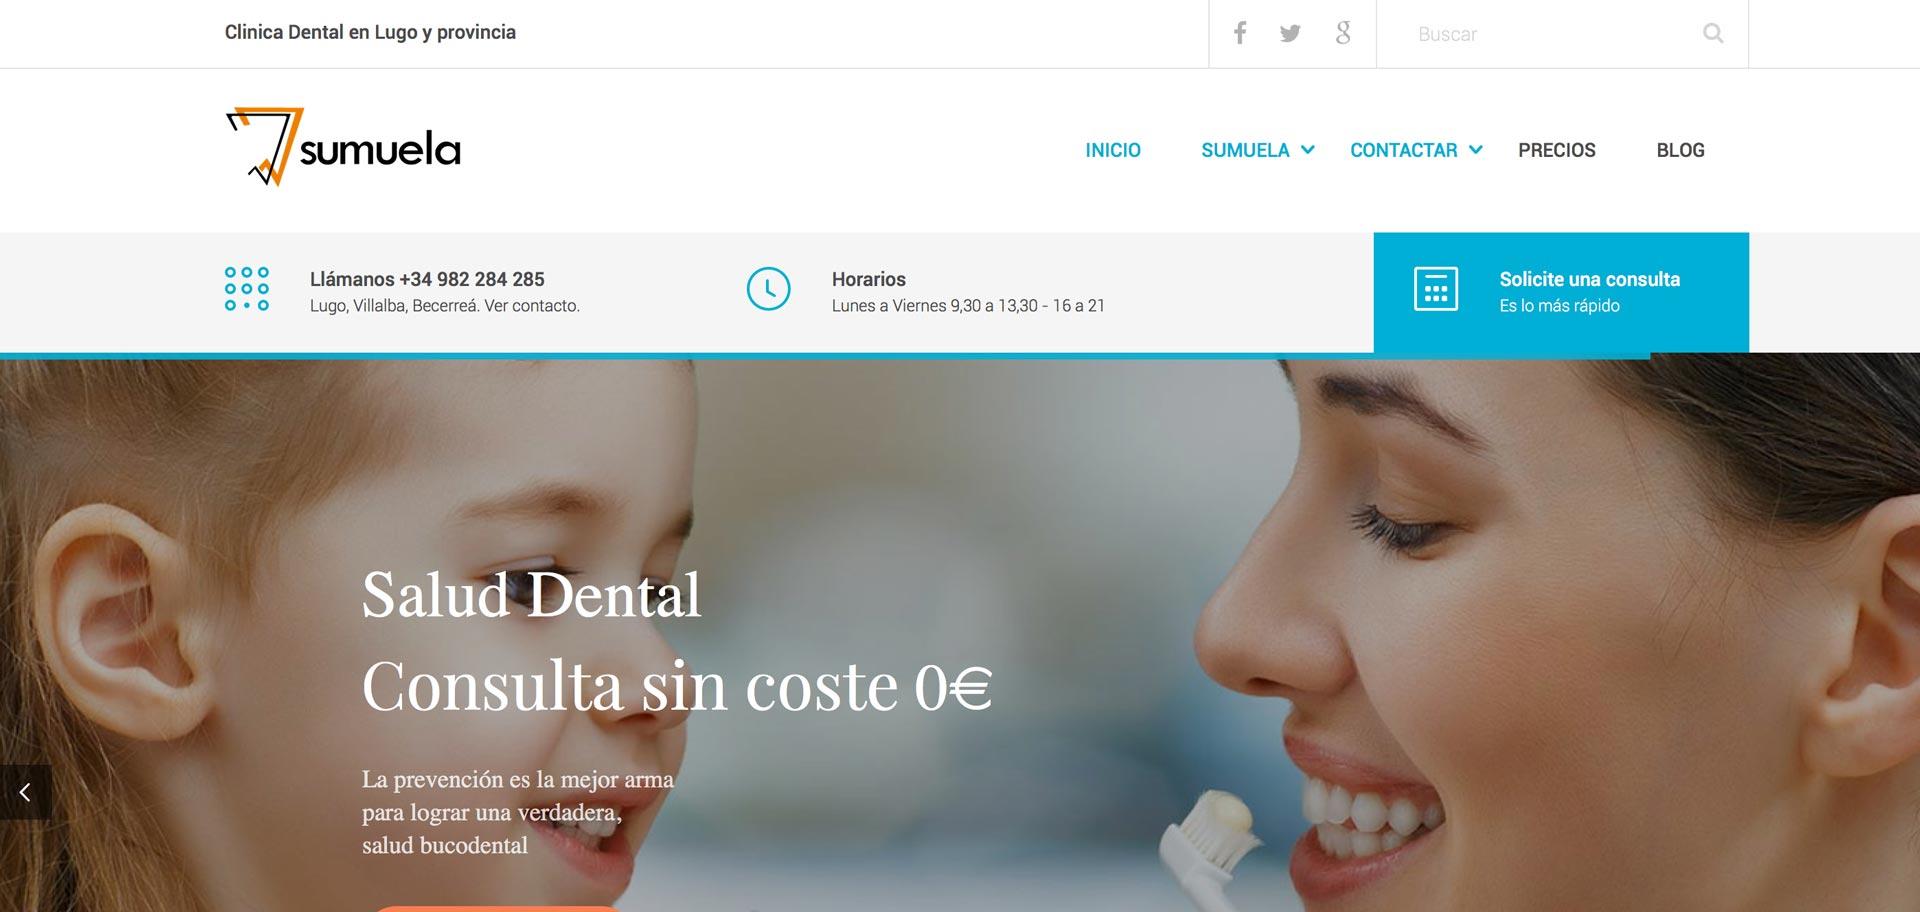 web corporativa de sumuela xeral.net